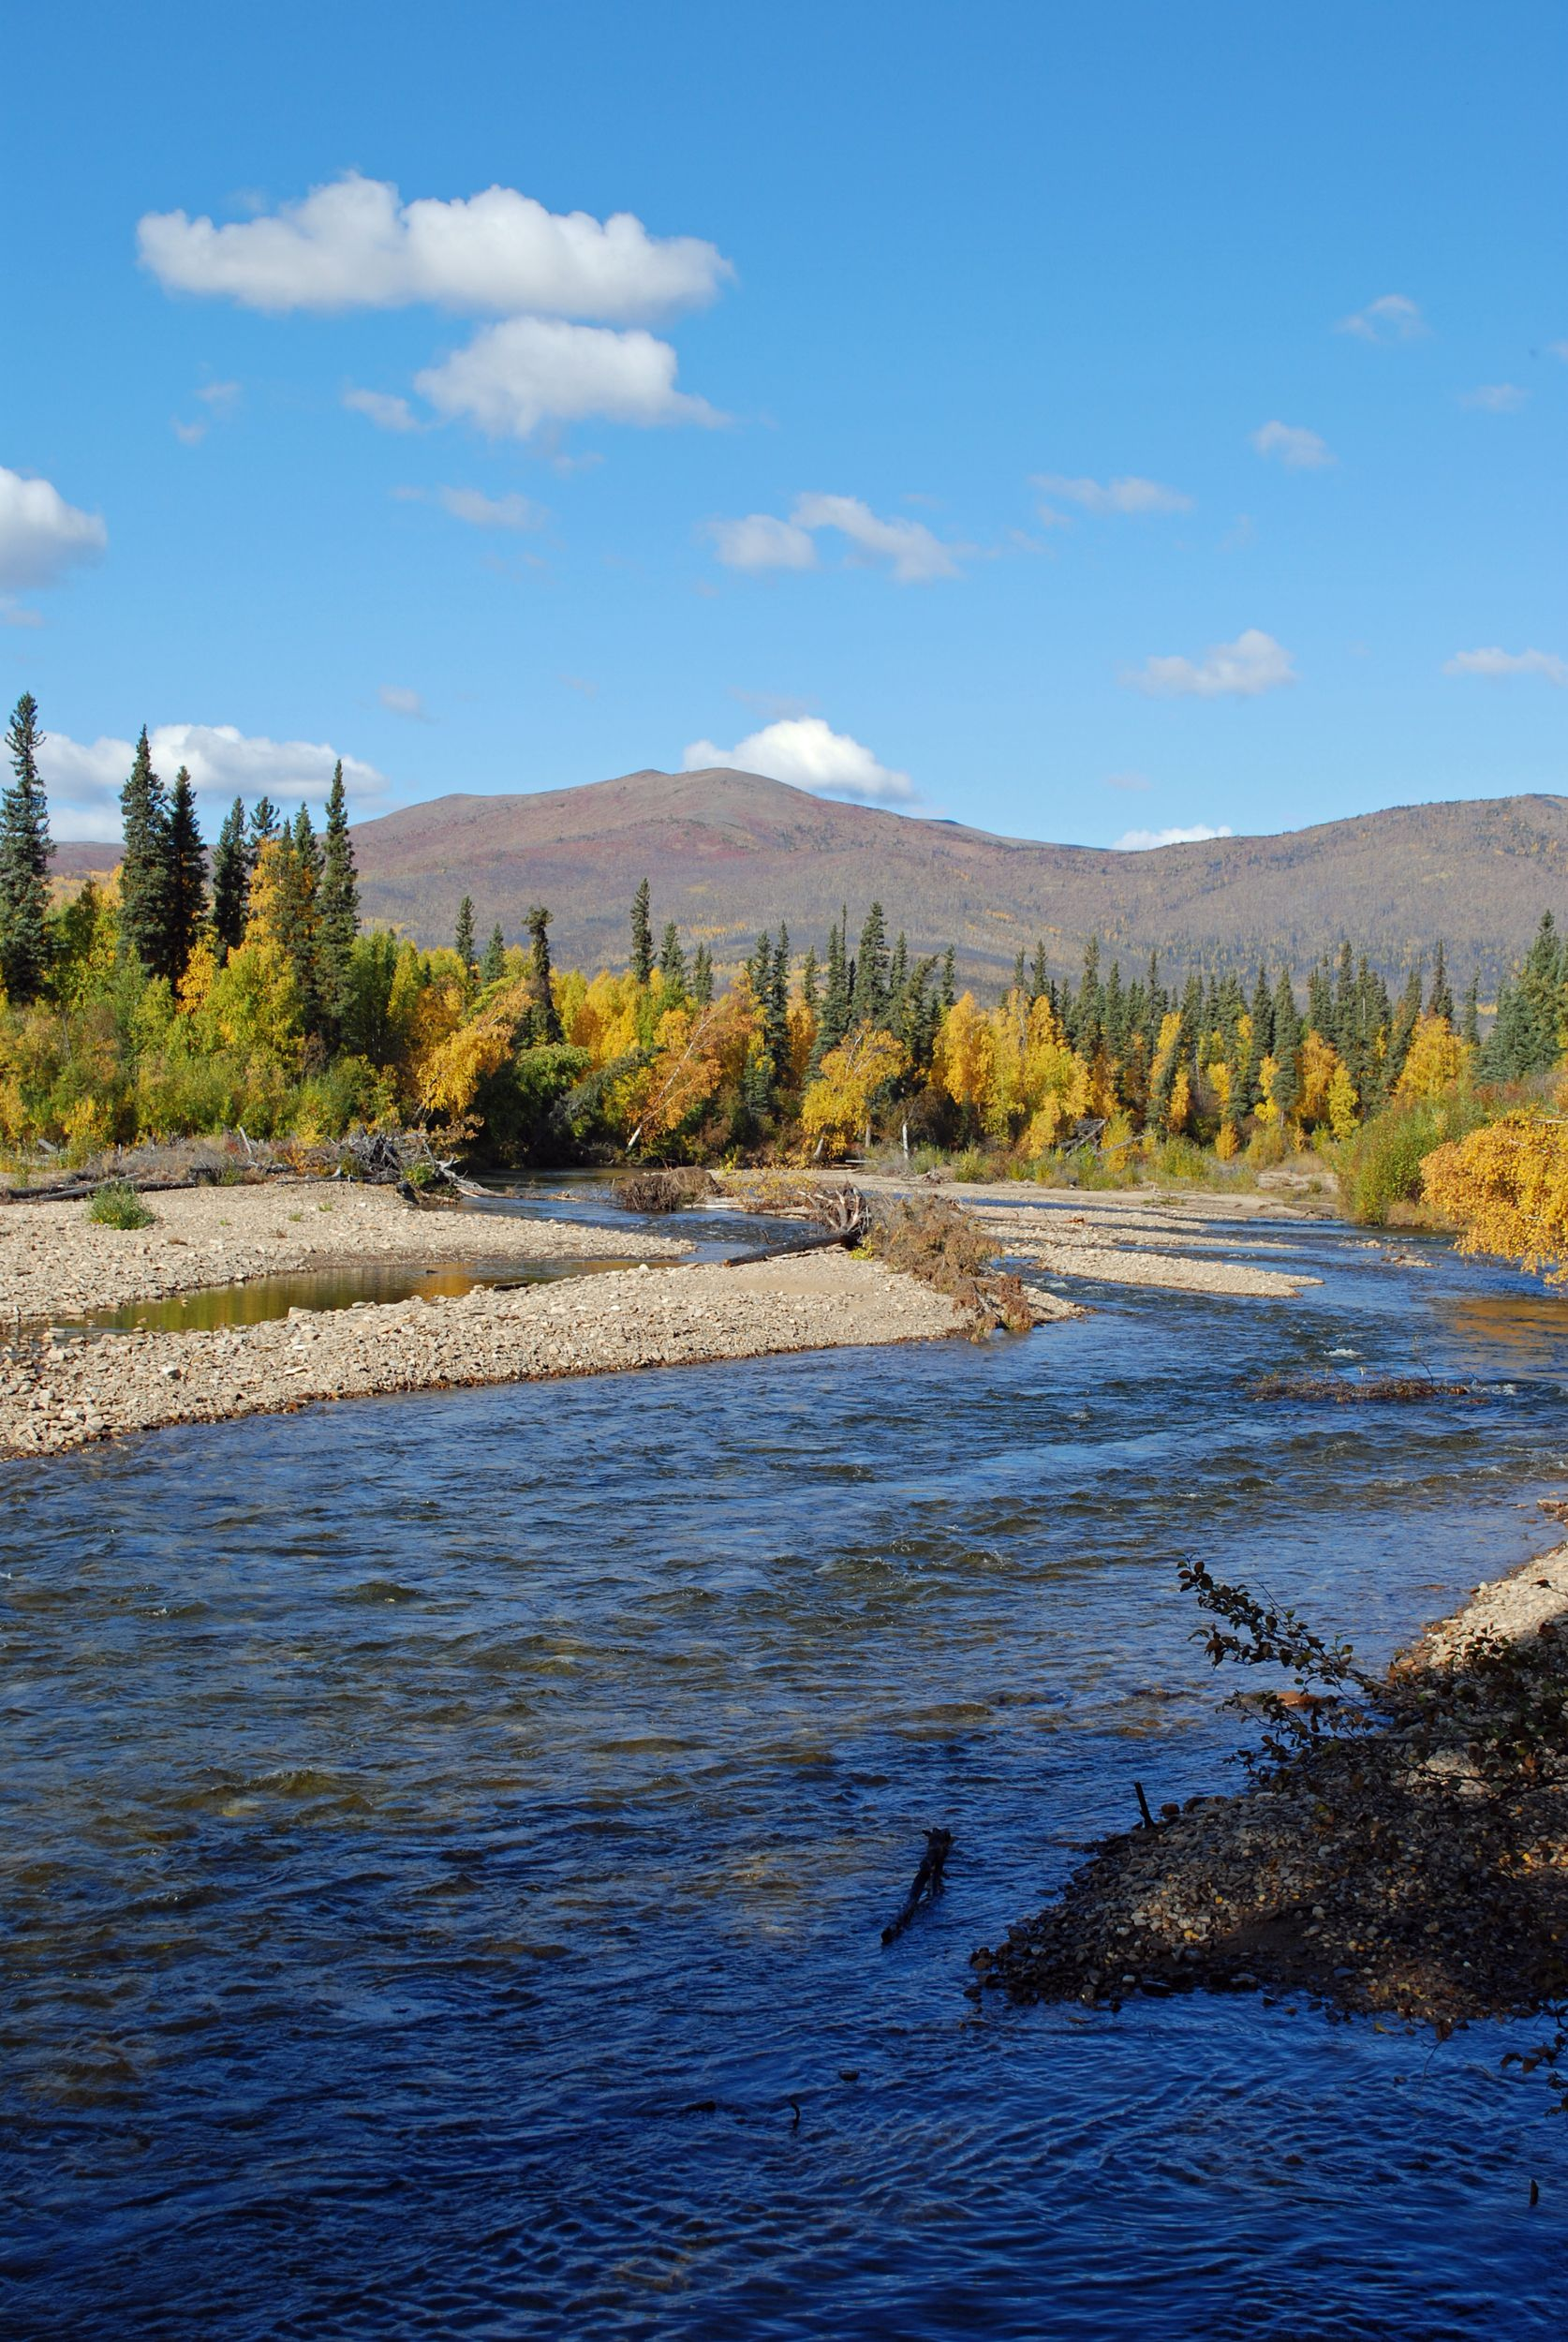 Chena river near fairbanks alaska travel nature for Fishing in fairbanks alaska